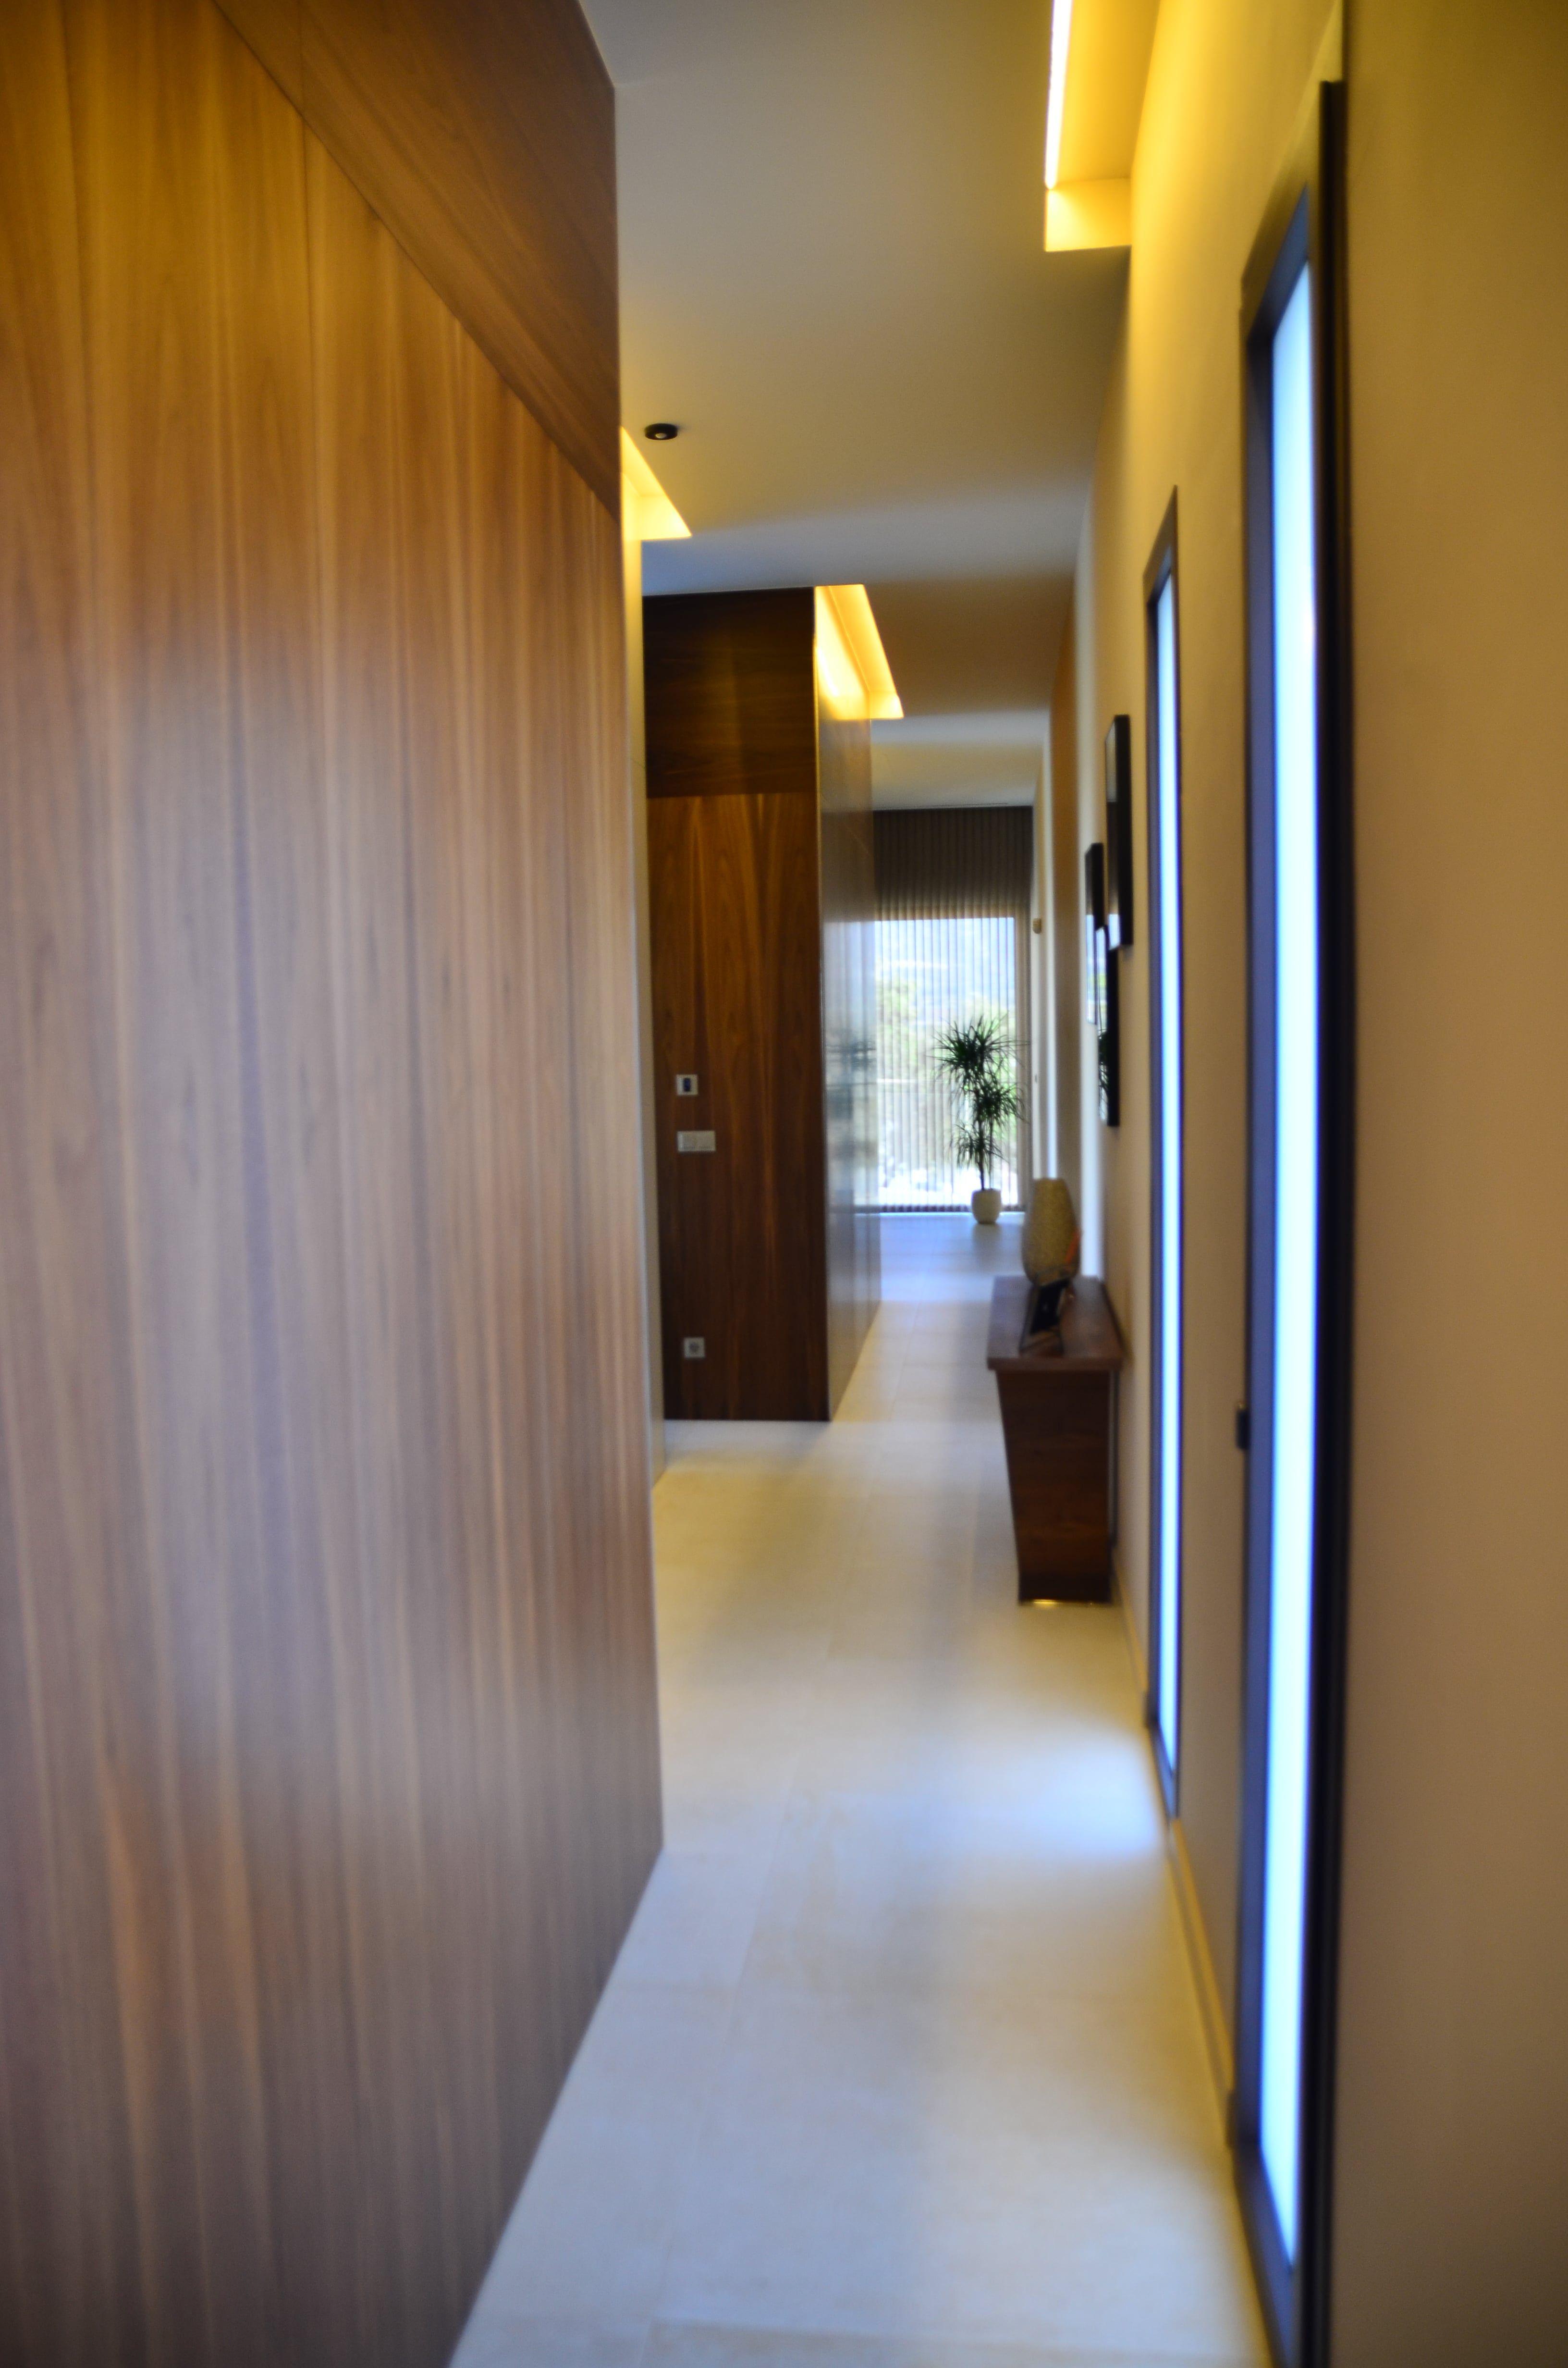 Iluminación pasillo vivienda Inel